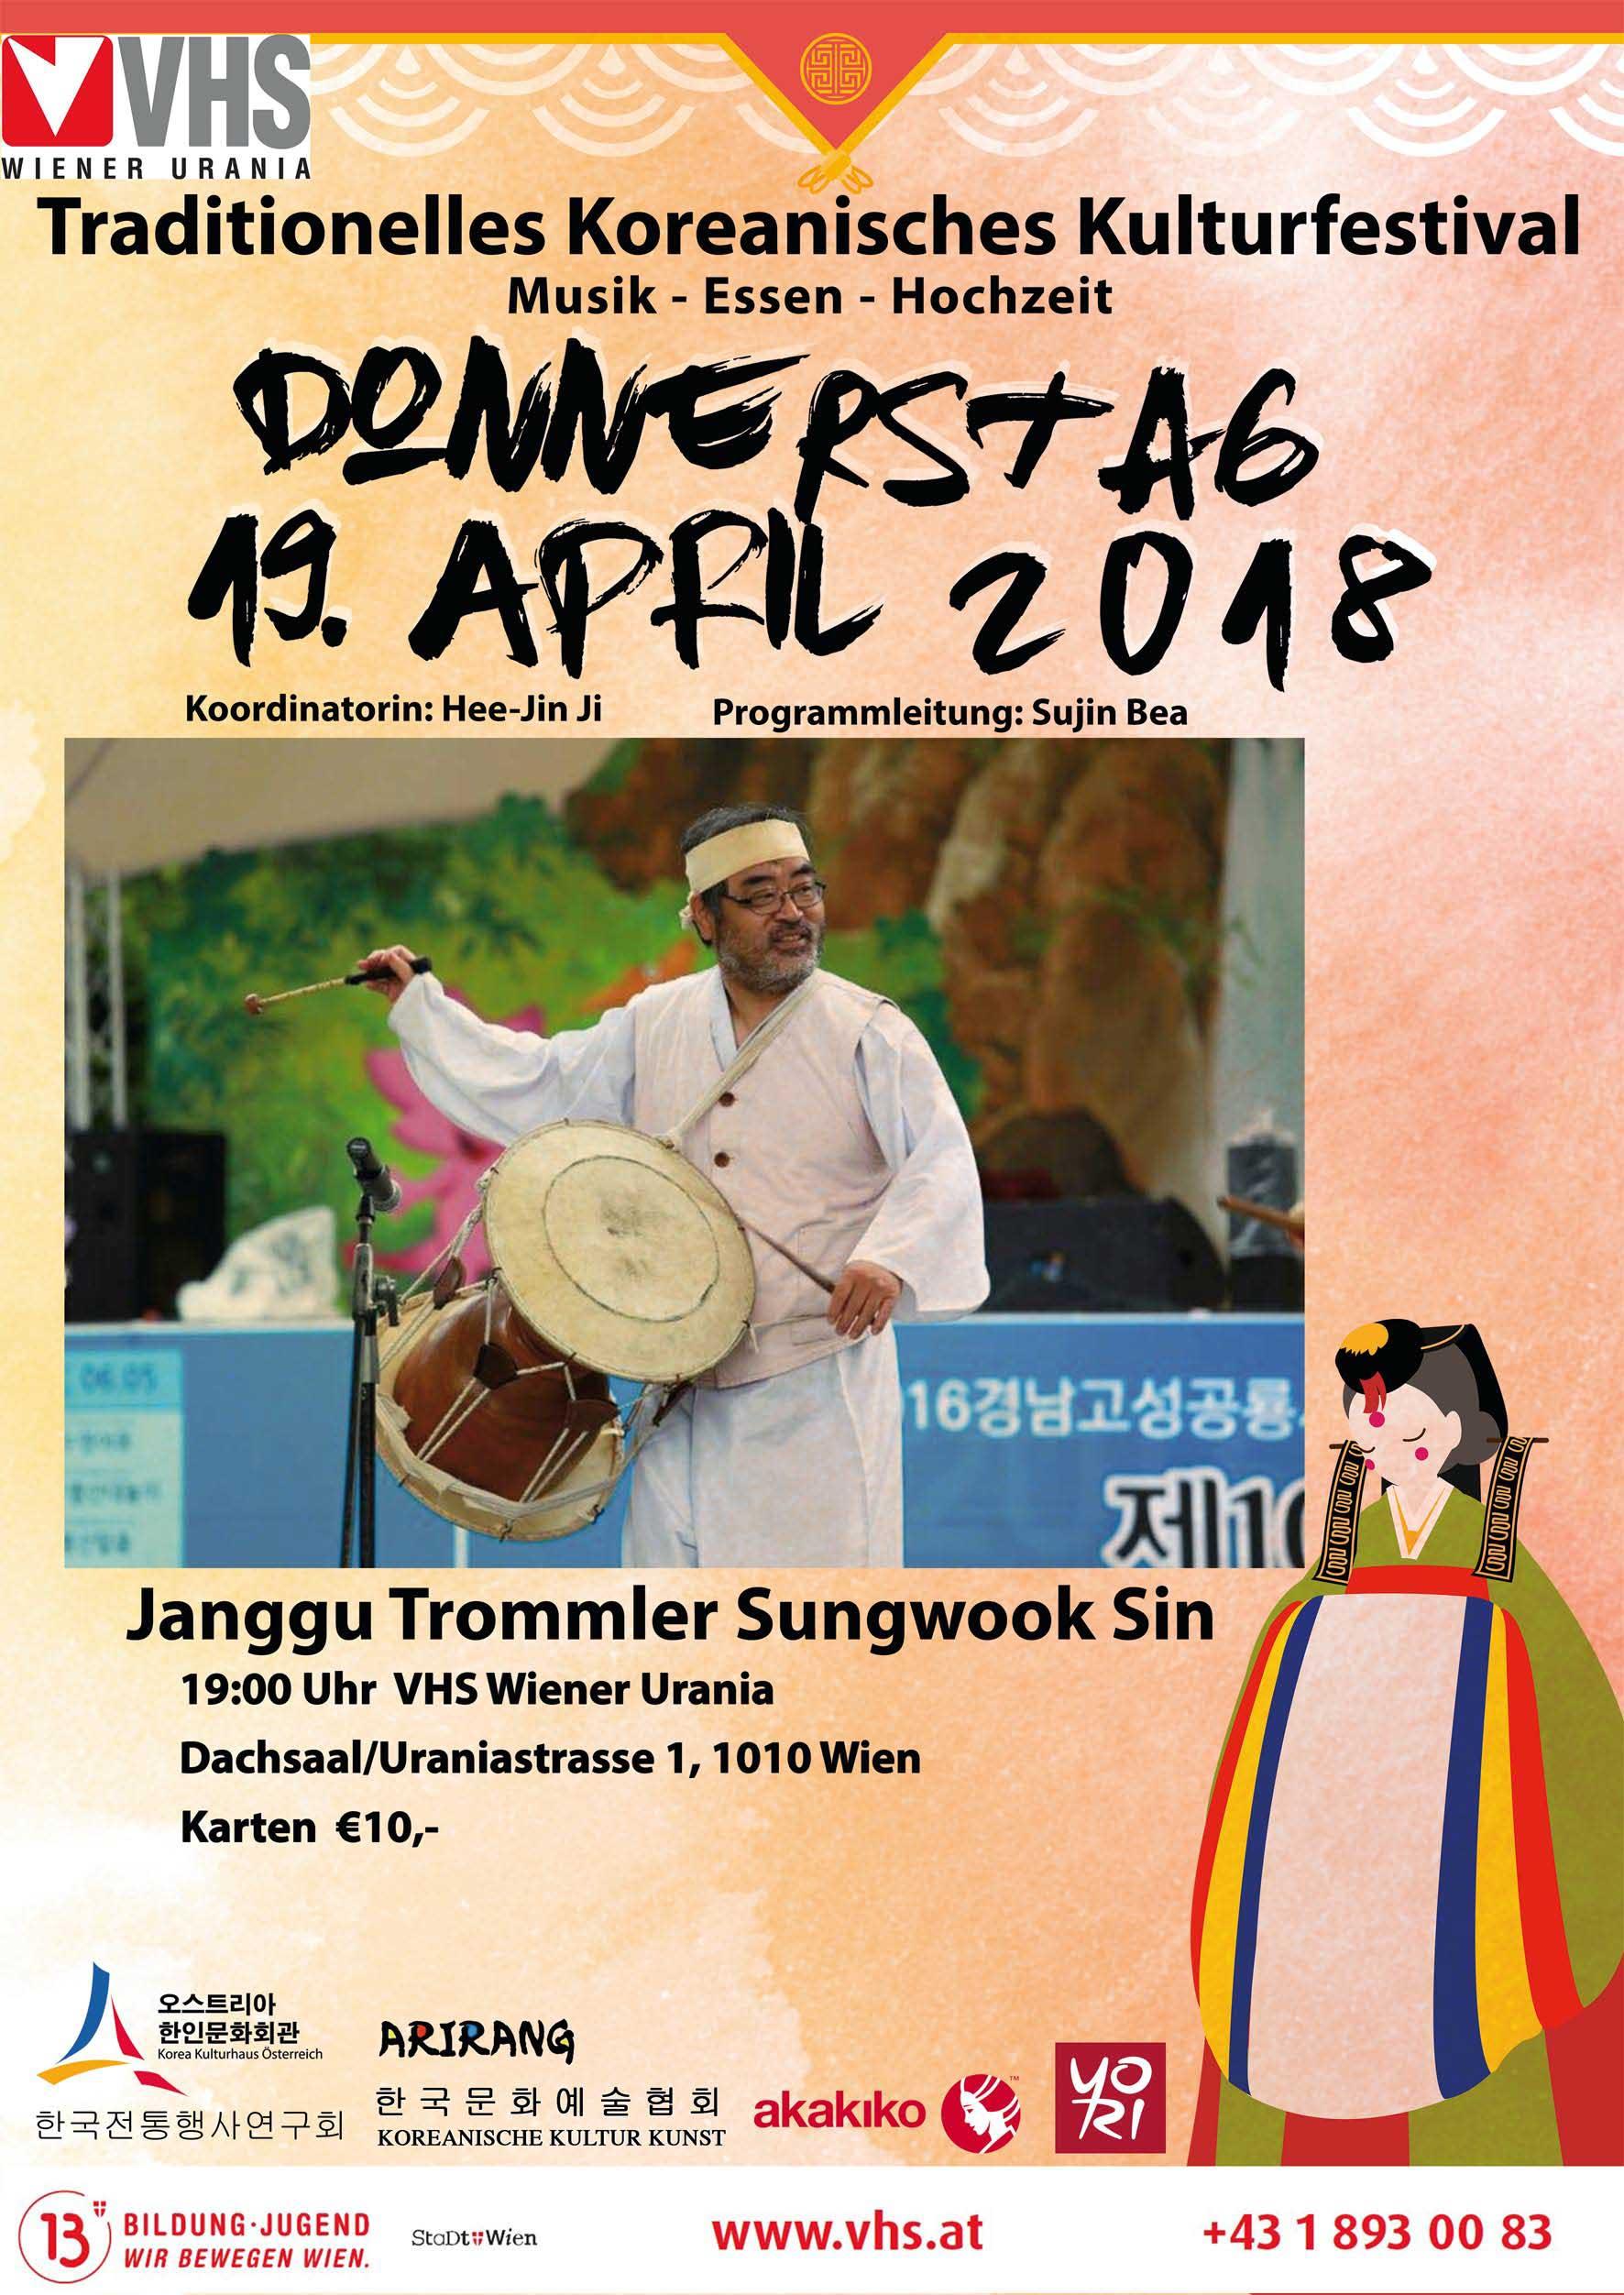 traditionelles Koreansiches Kulturfestival